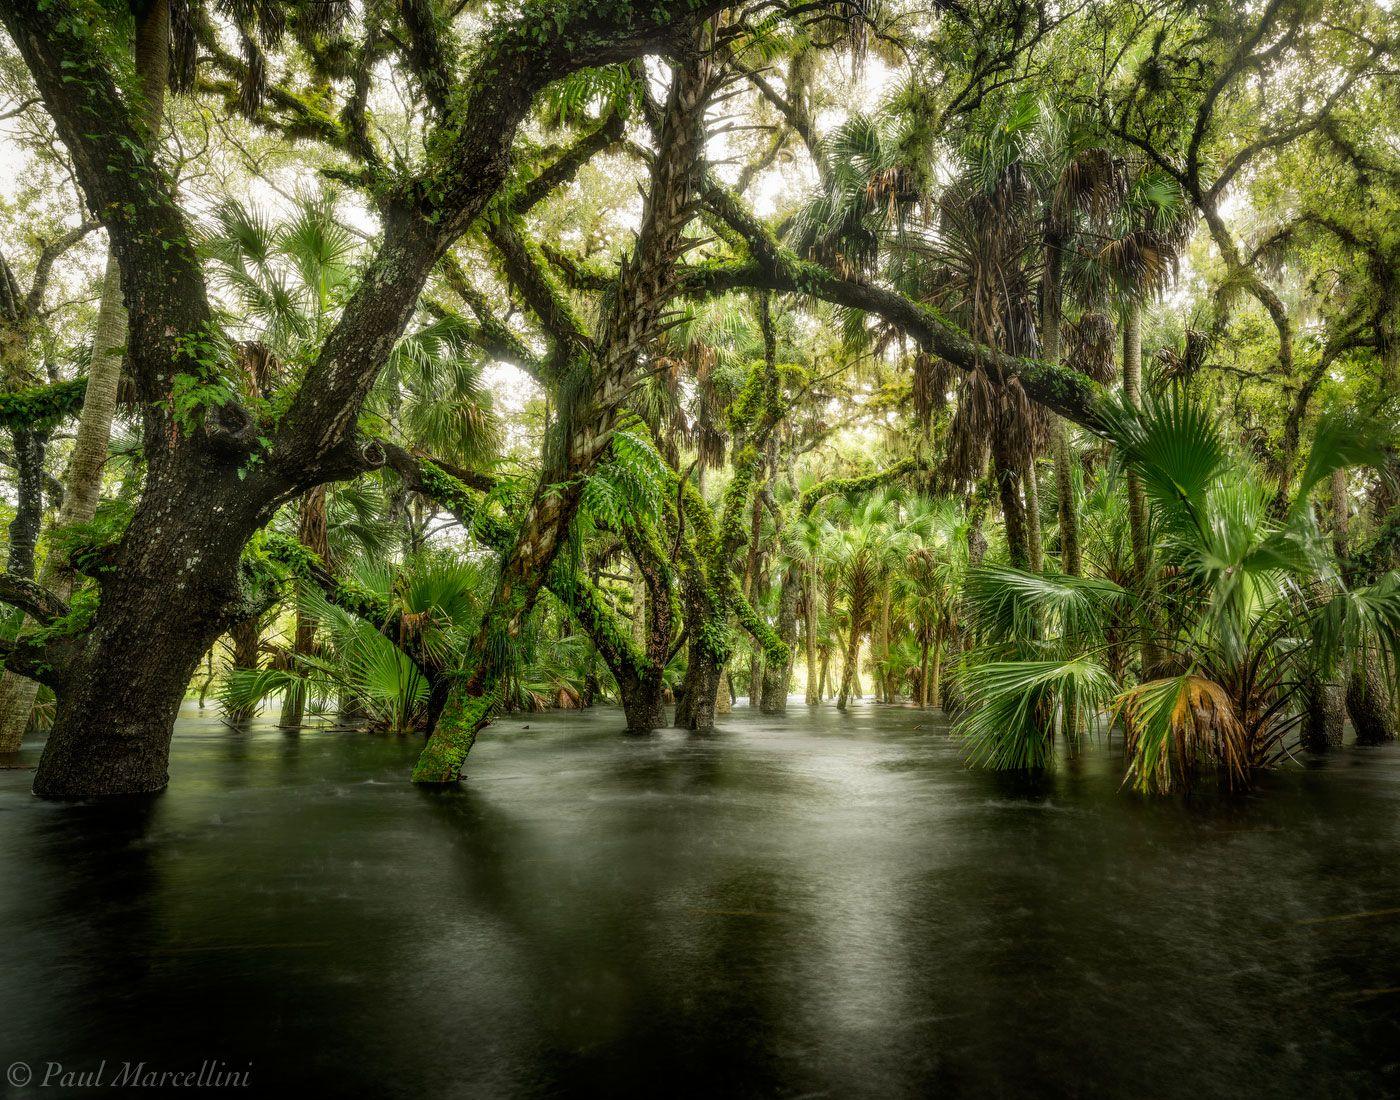 Beauty of Myakka River State Park floridatreasures